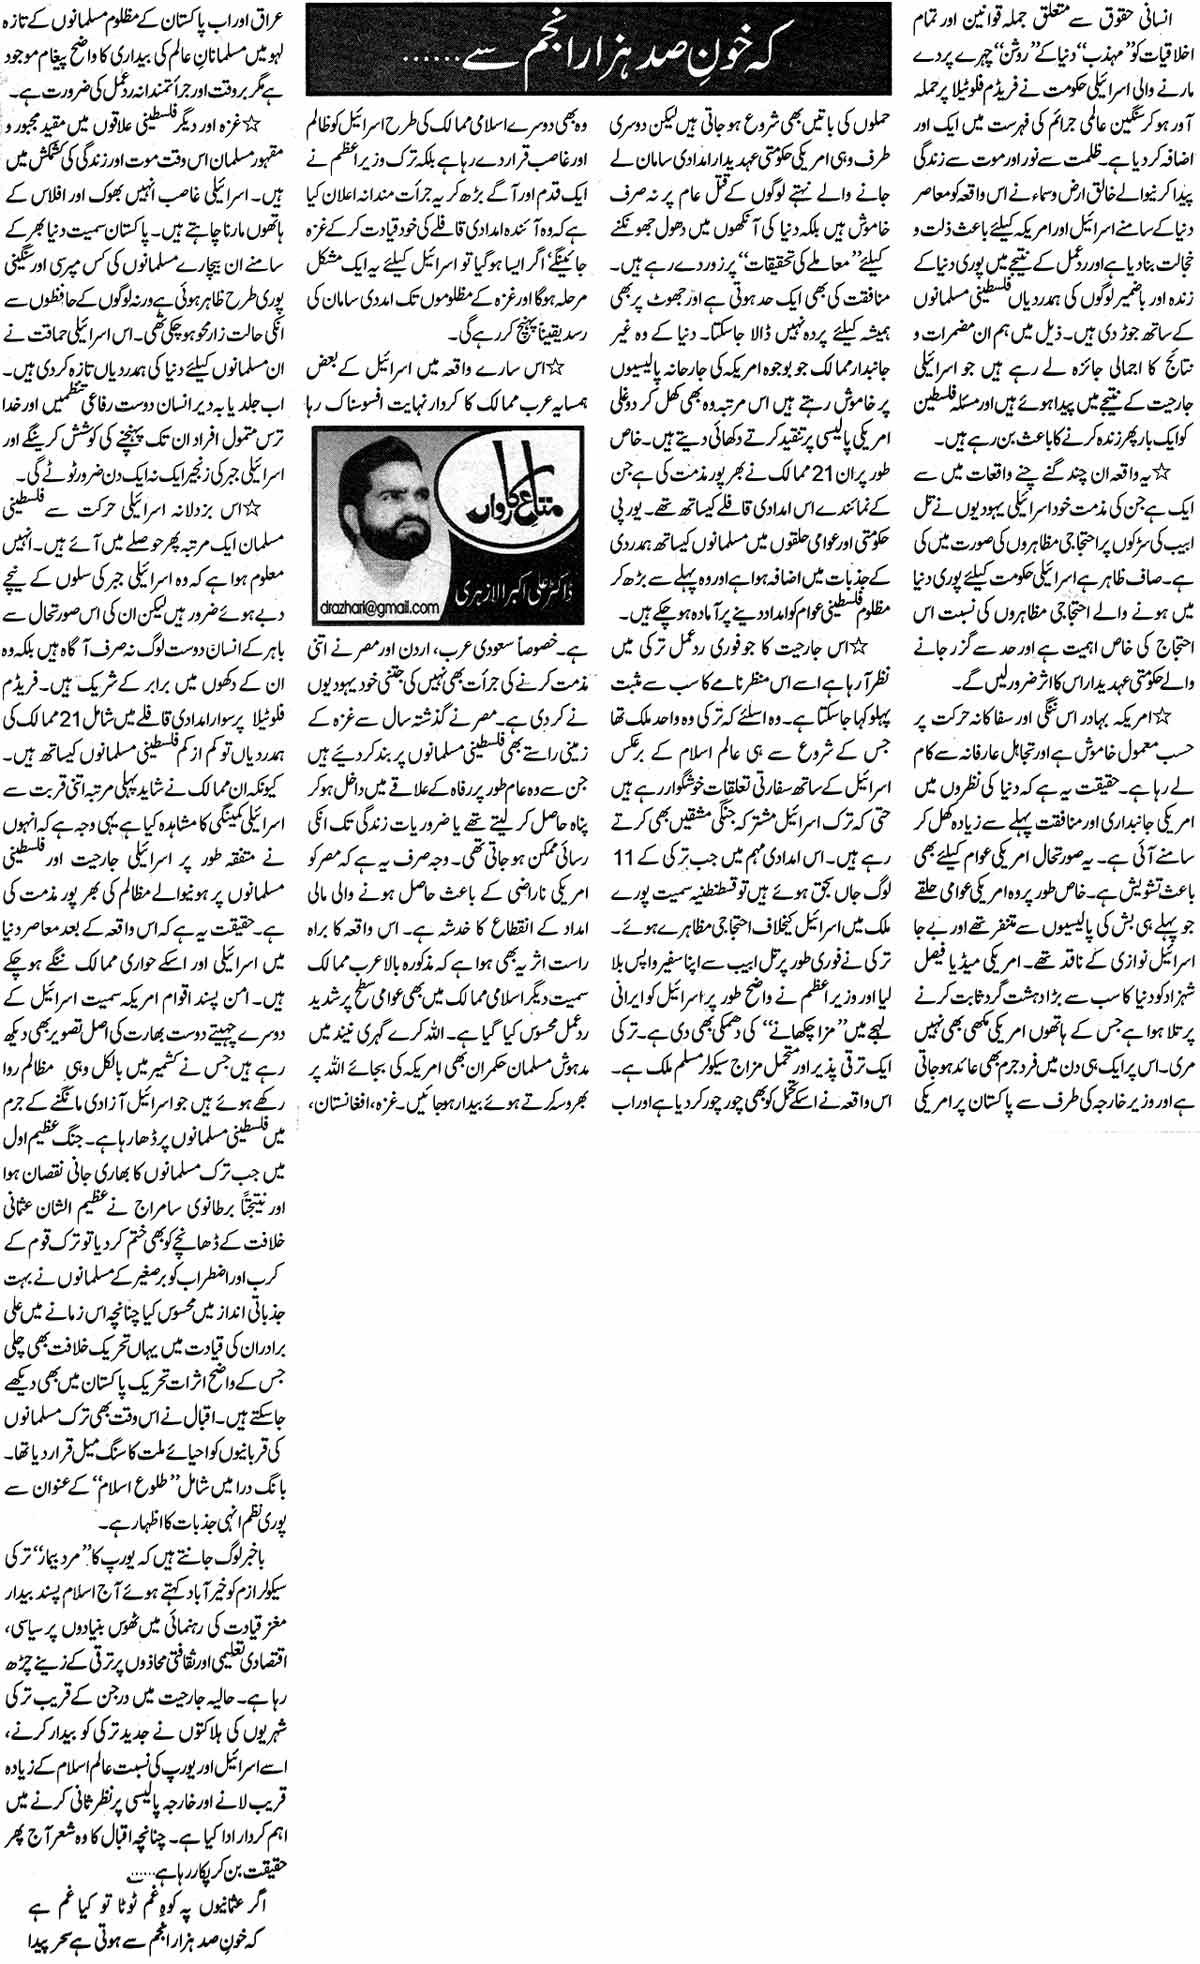 تحریک منہاج القرآن Minhaj-ul-Quran  Print Media Coverage پرنٹ میڈیا کوریج Daily Nawa-i-Waqt Editorial Page